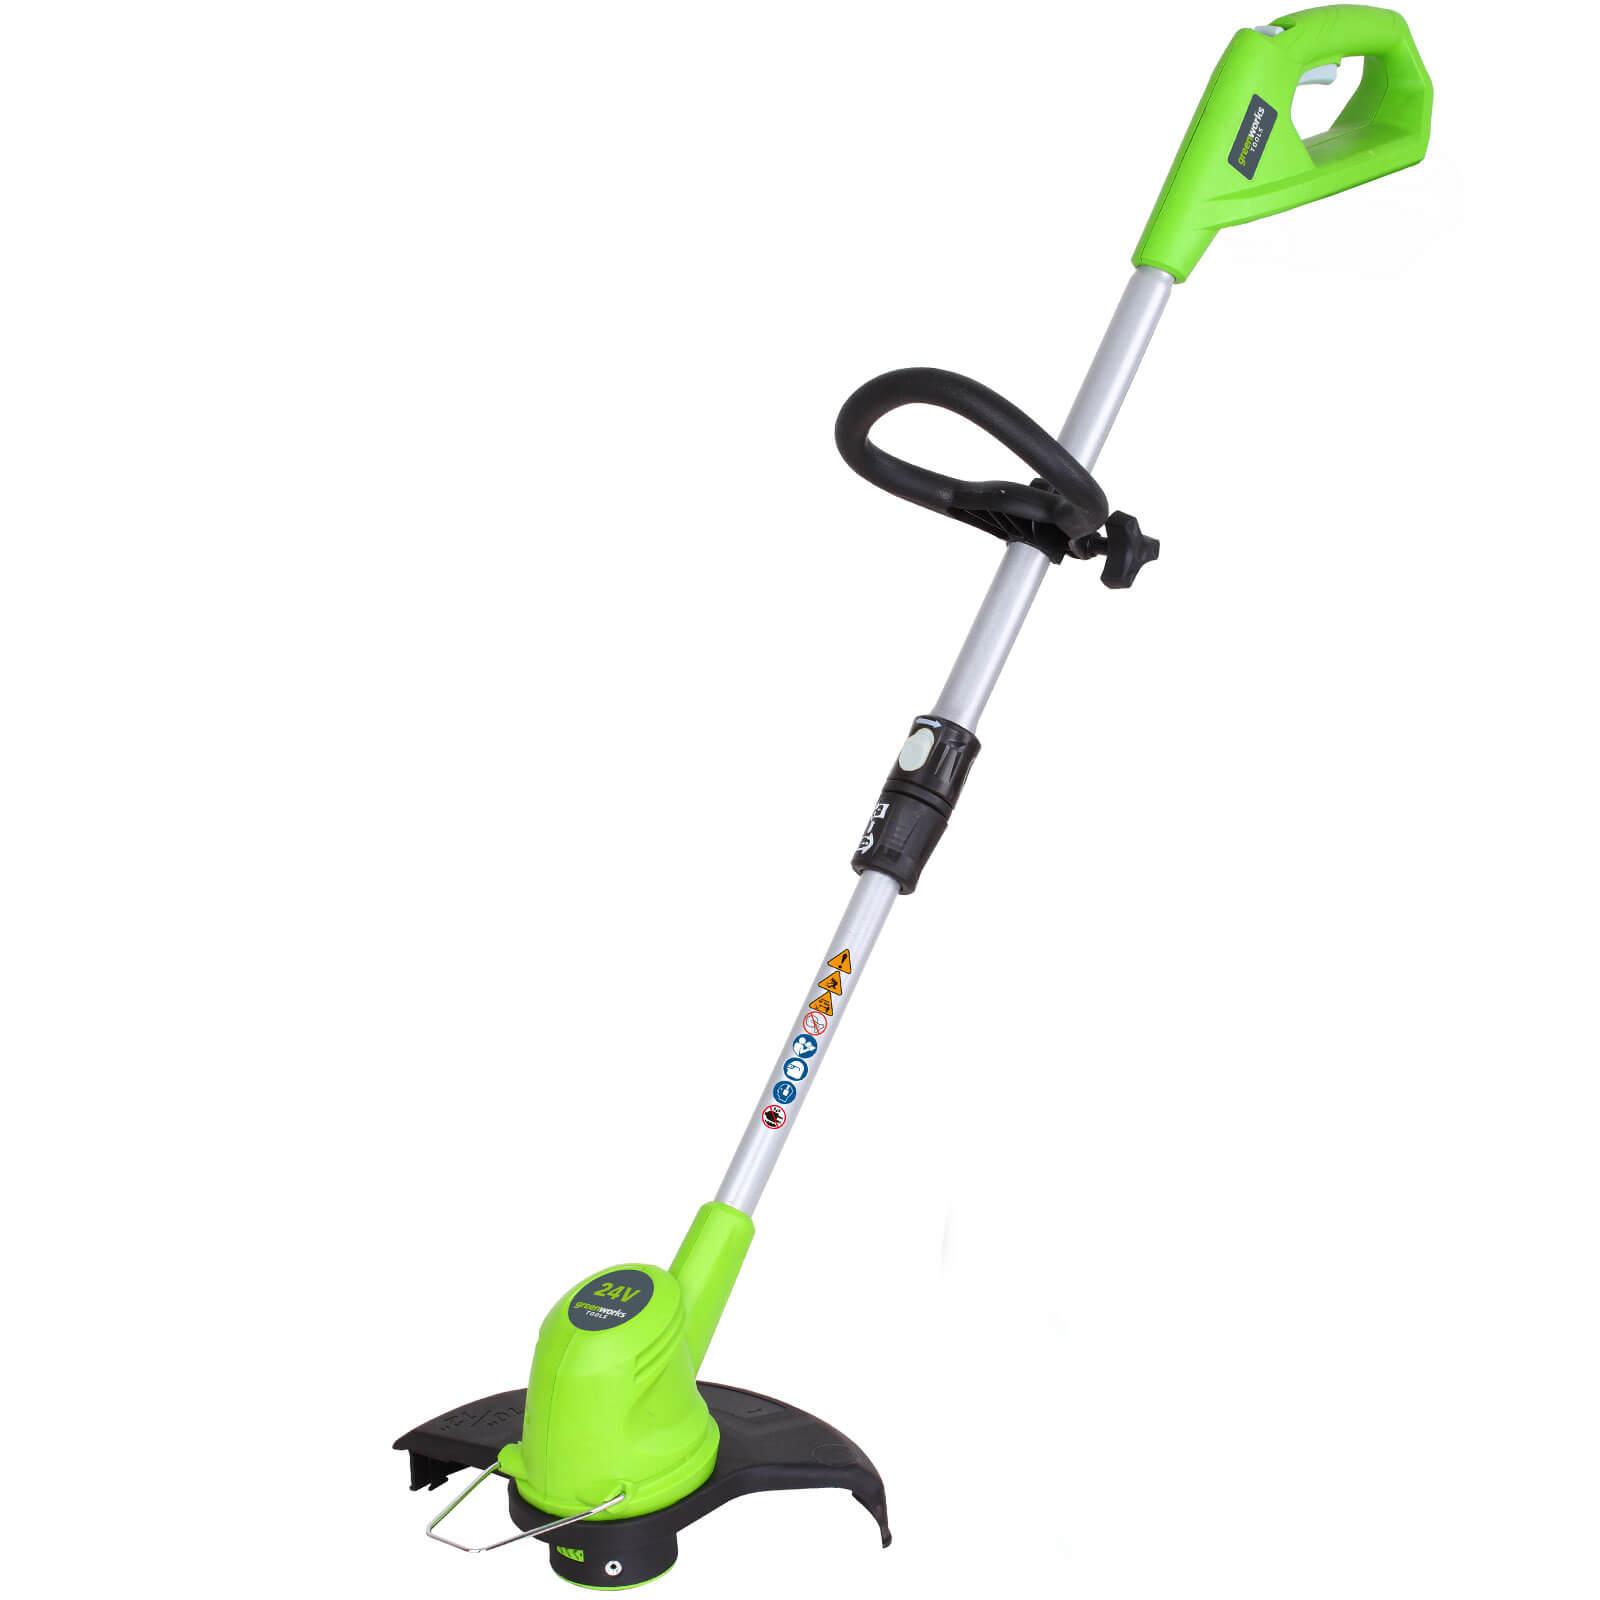 Buy cheap cordless grass trimmer compare garden tools for Garden equipment deals